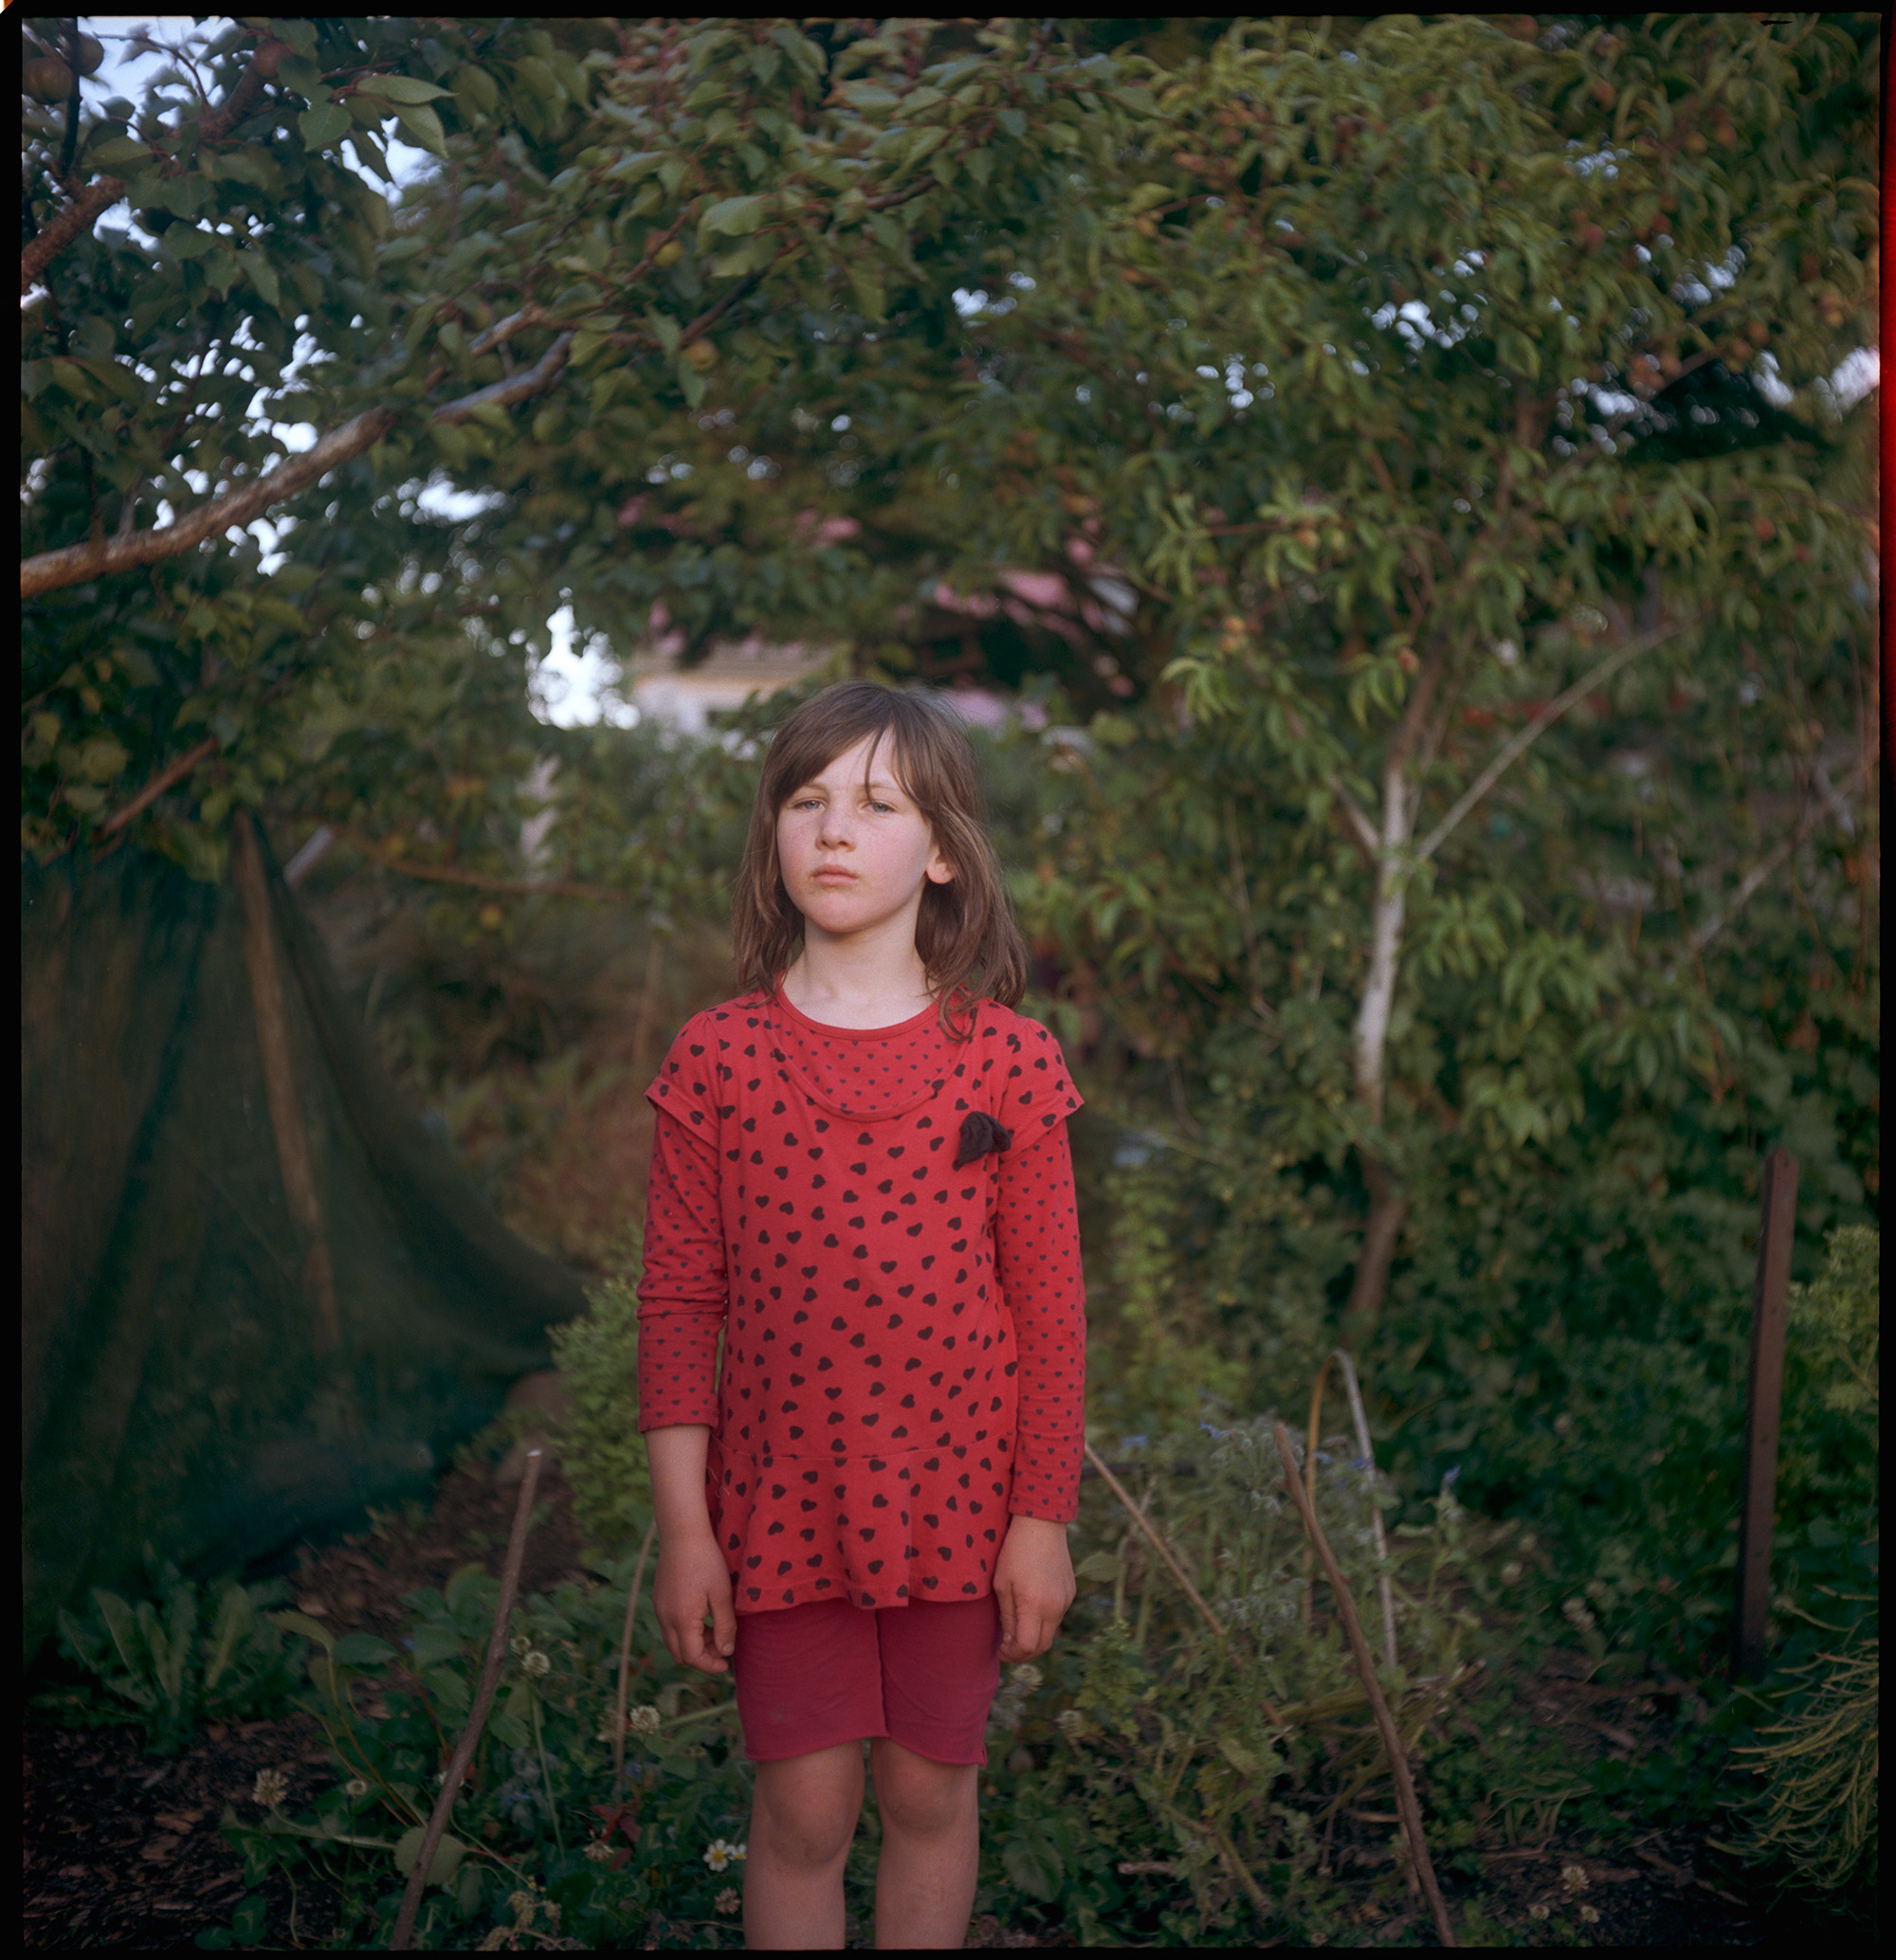 005-mickey-ross-portrait-photographer.JPG